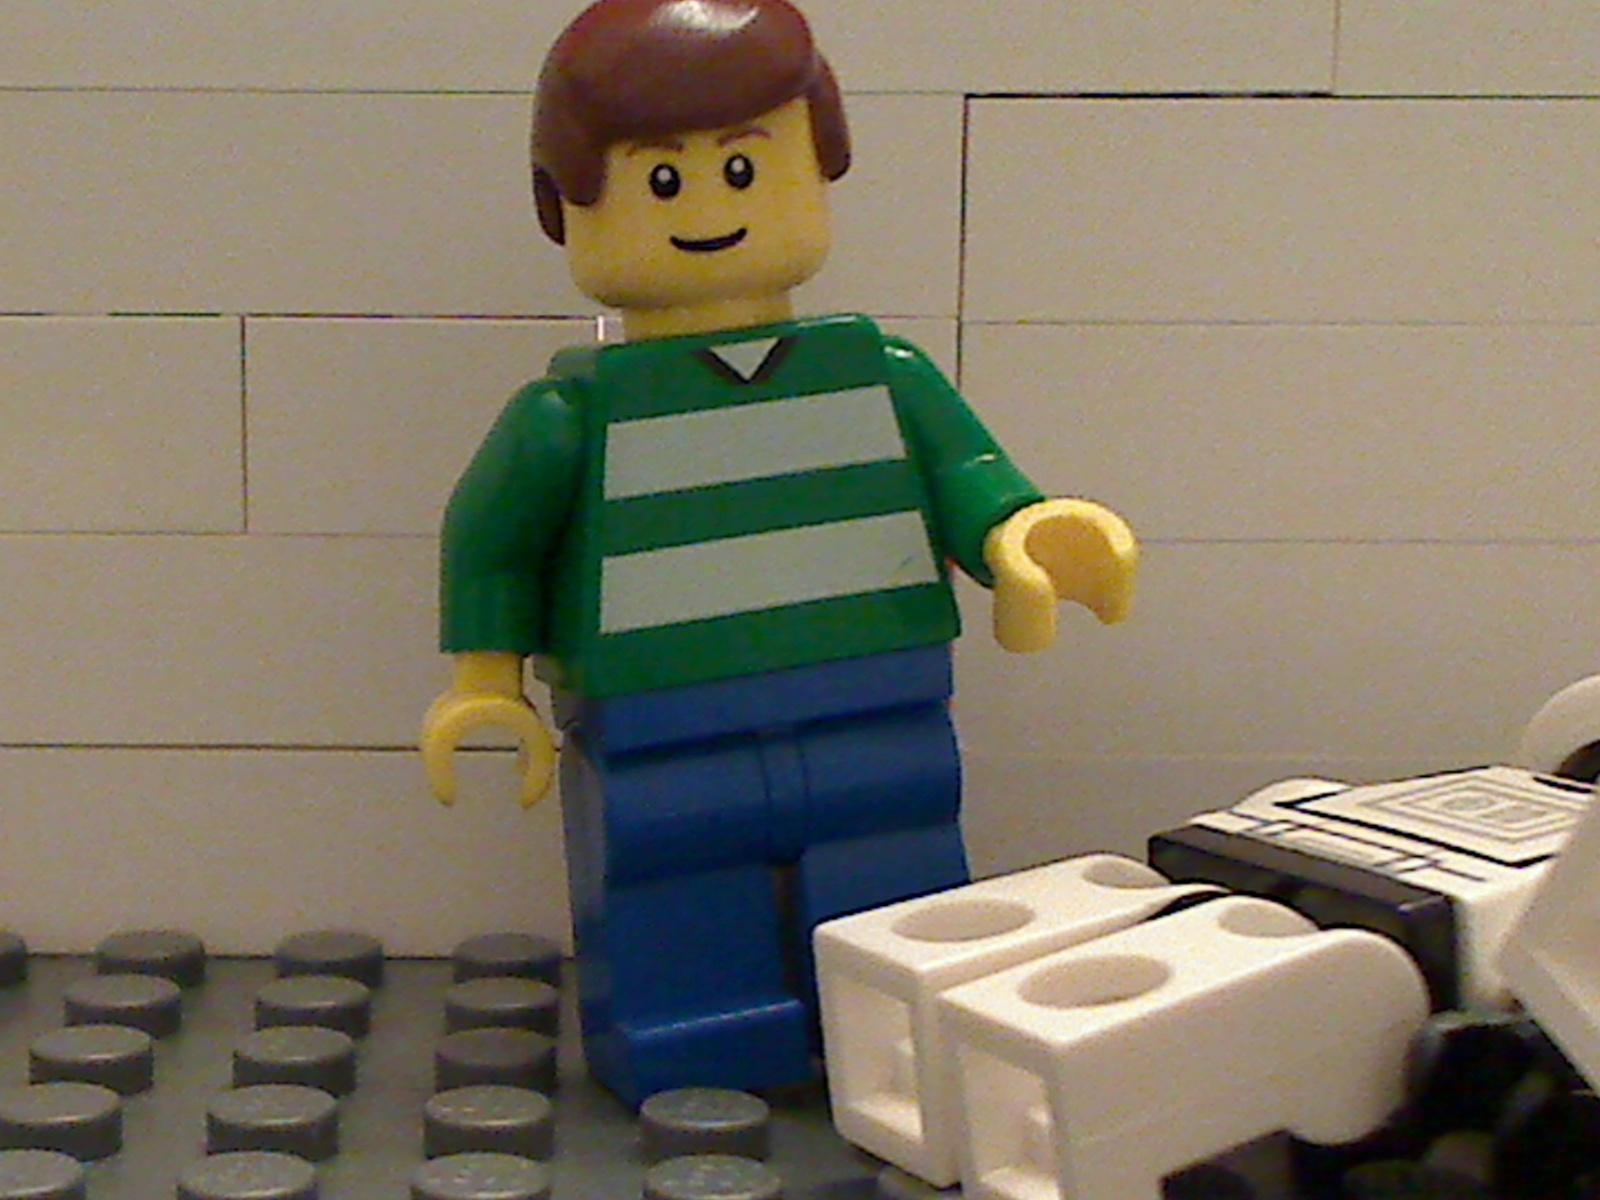 http://www.brickshelf.com/gallery/fib12345/Stills/picture_62.jpg